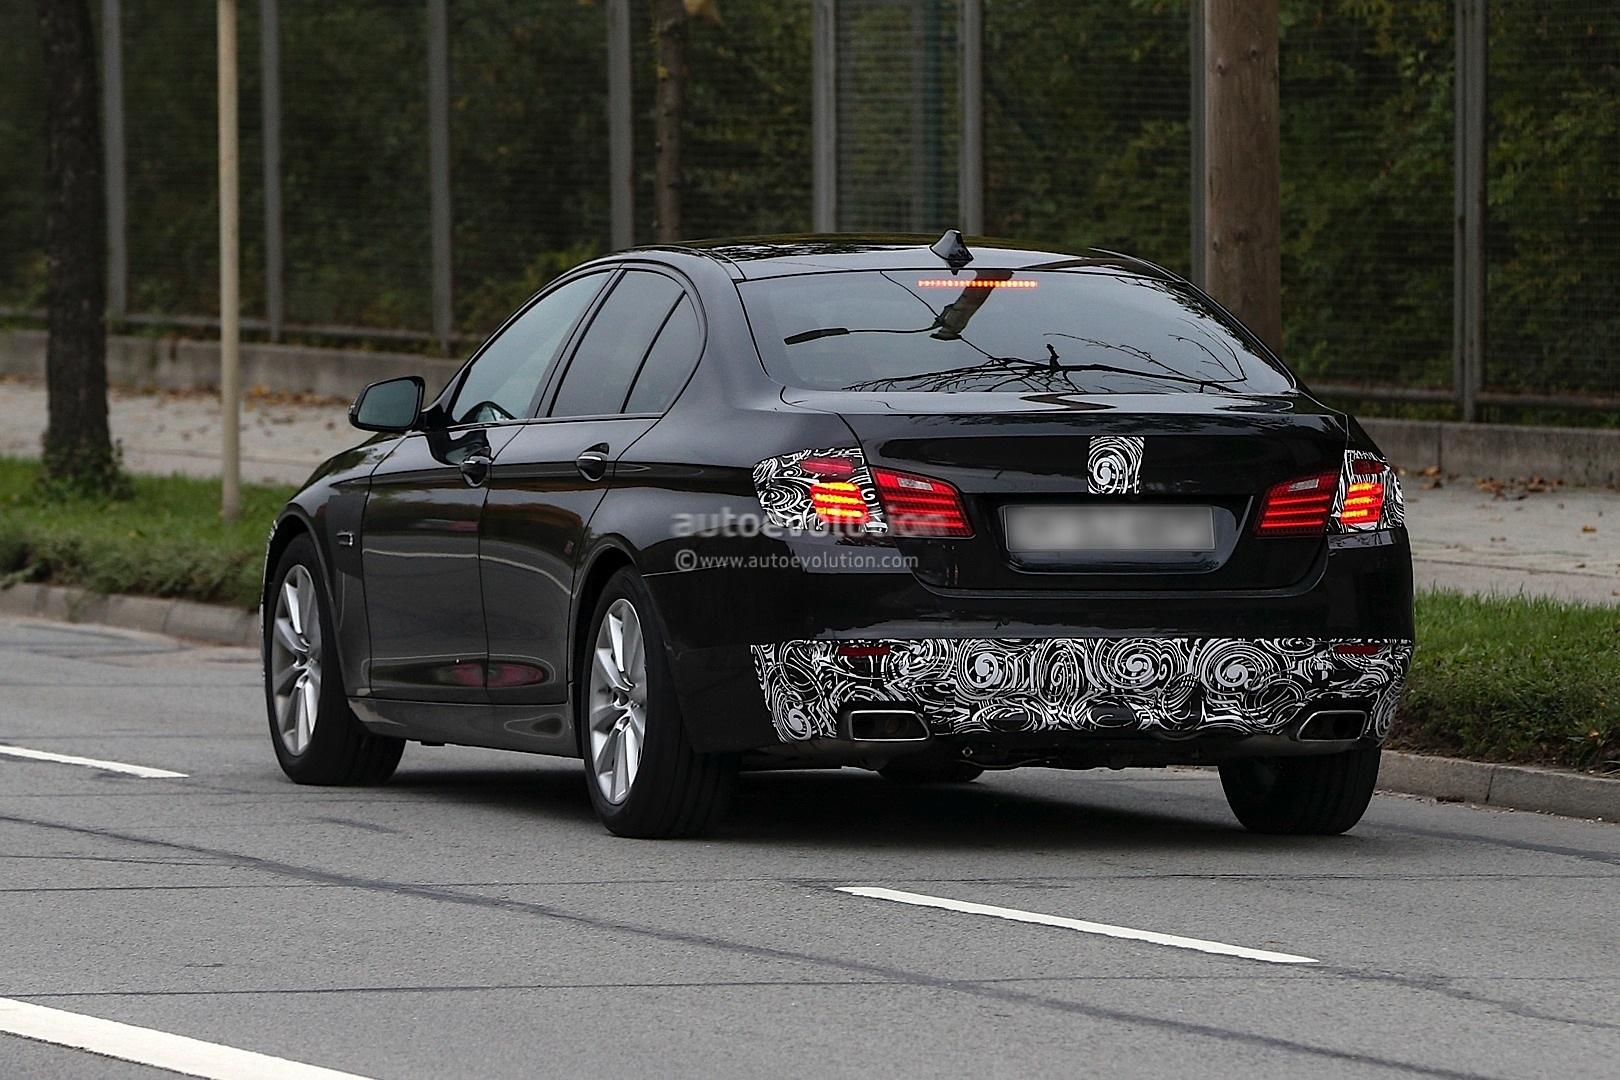 Spyshots: 2013 BMW F10 5-Series Facelift (LCI)